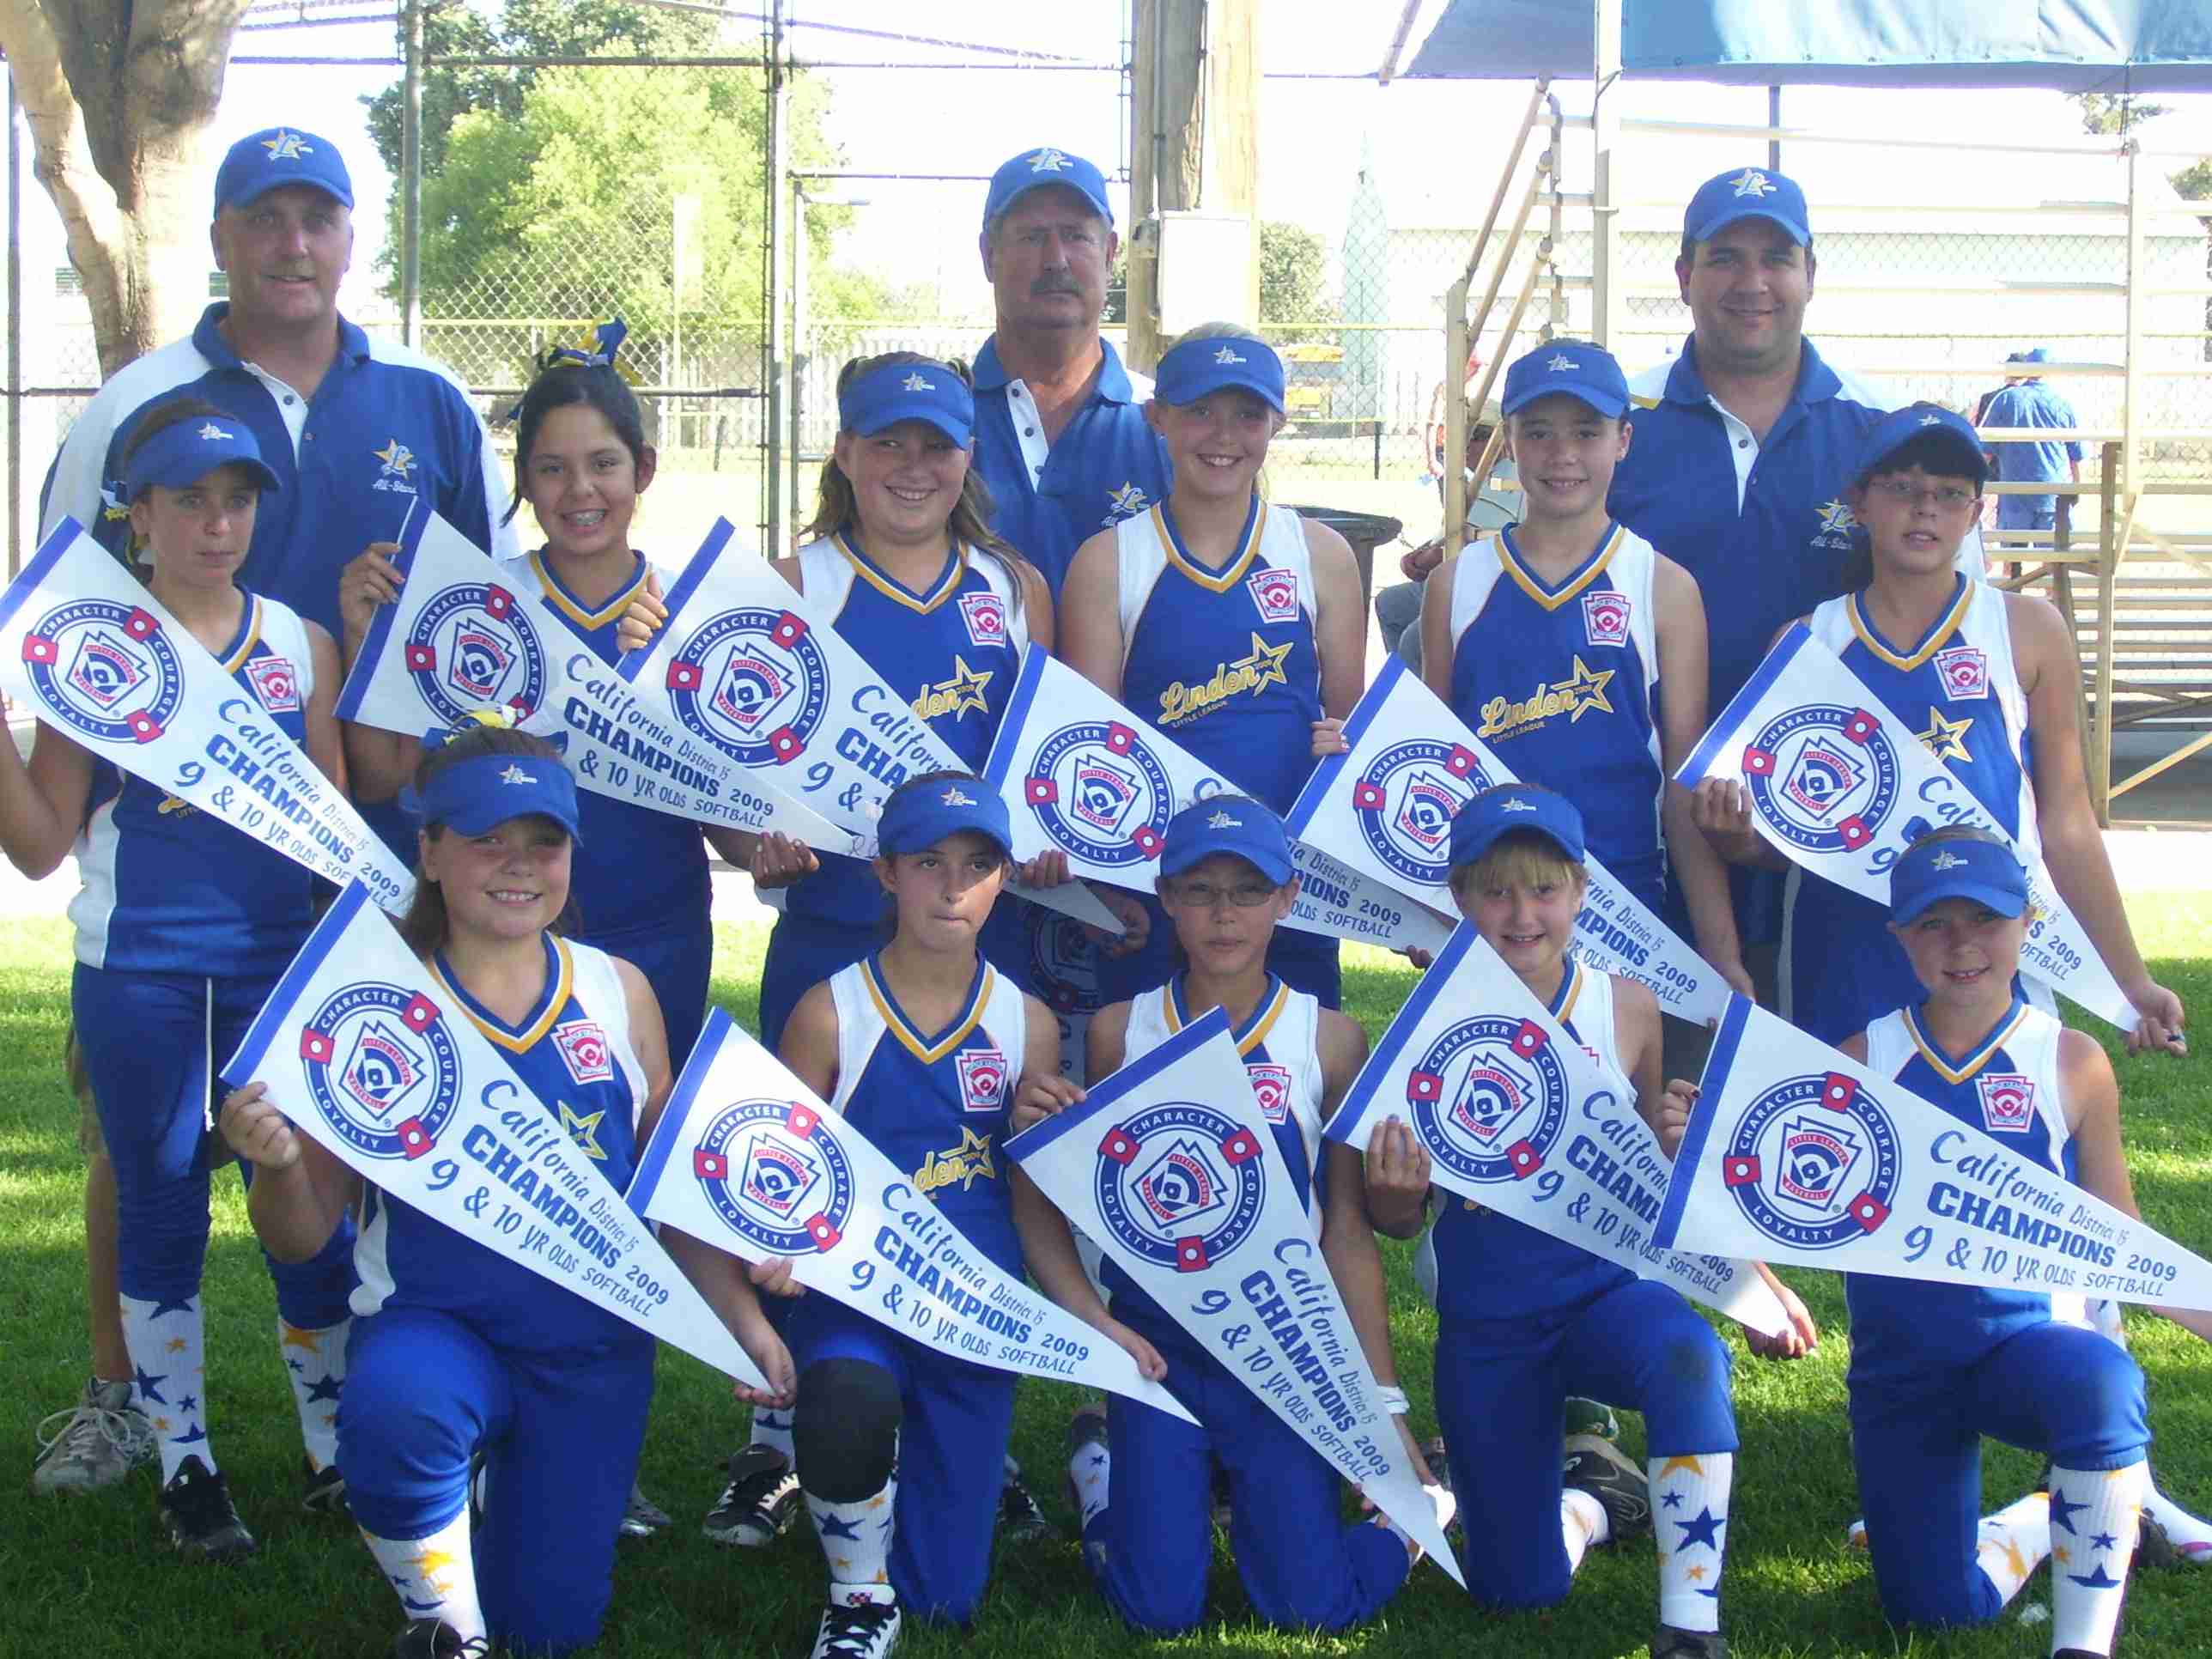 Linden 9 & 10 yr old SB Champions